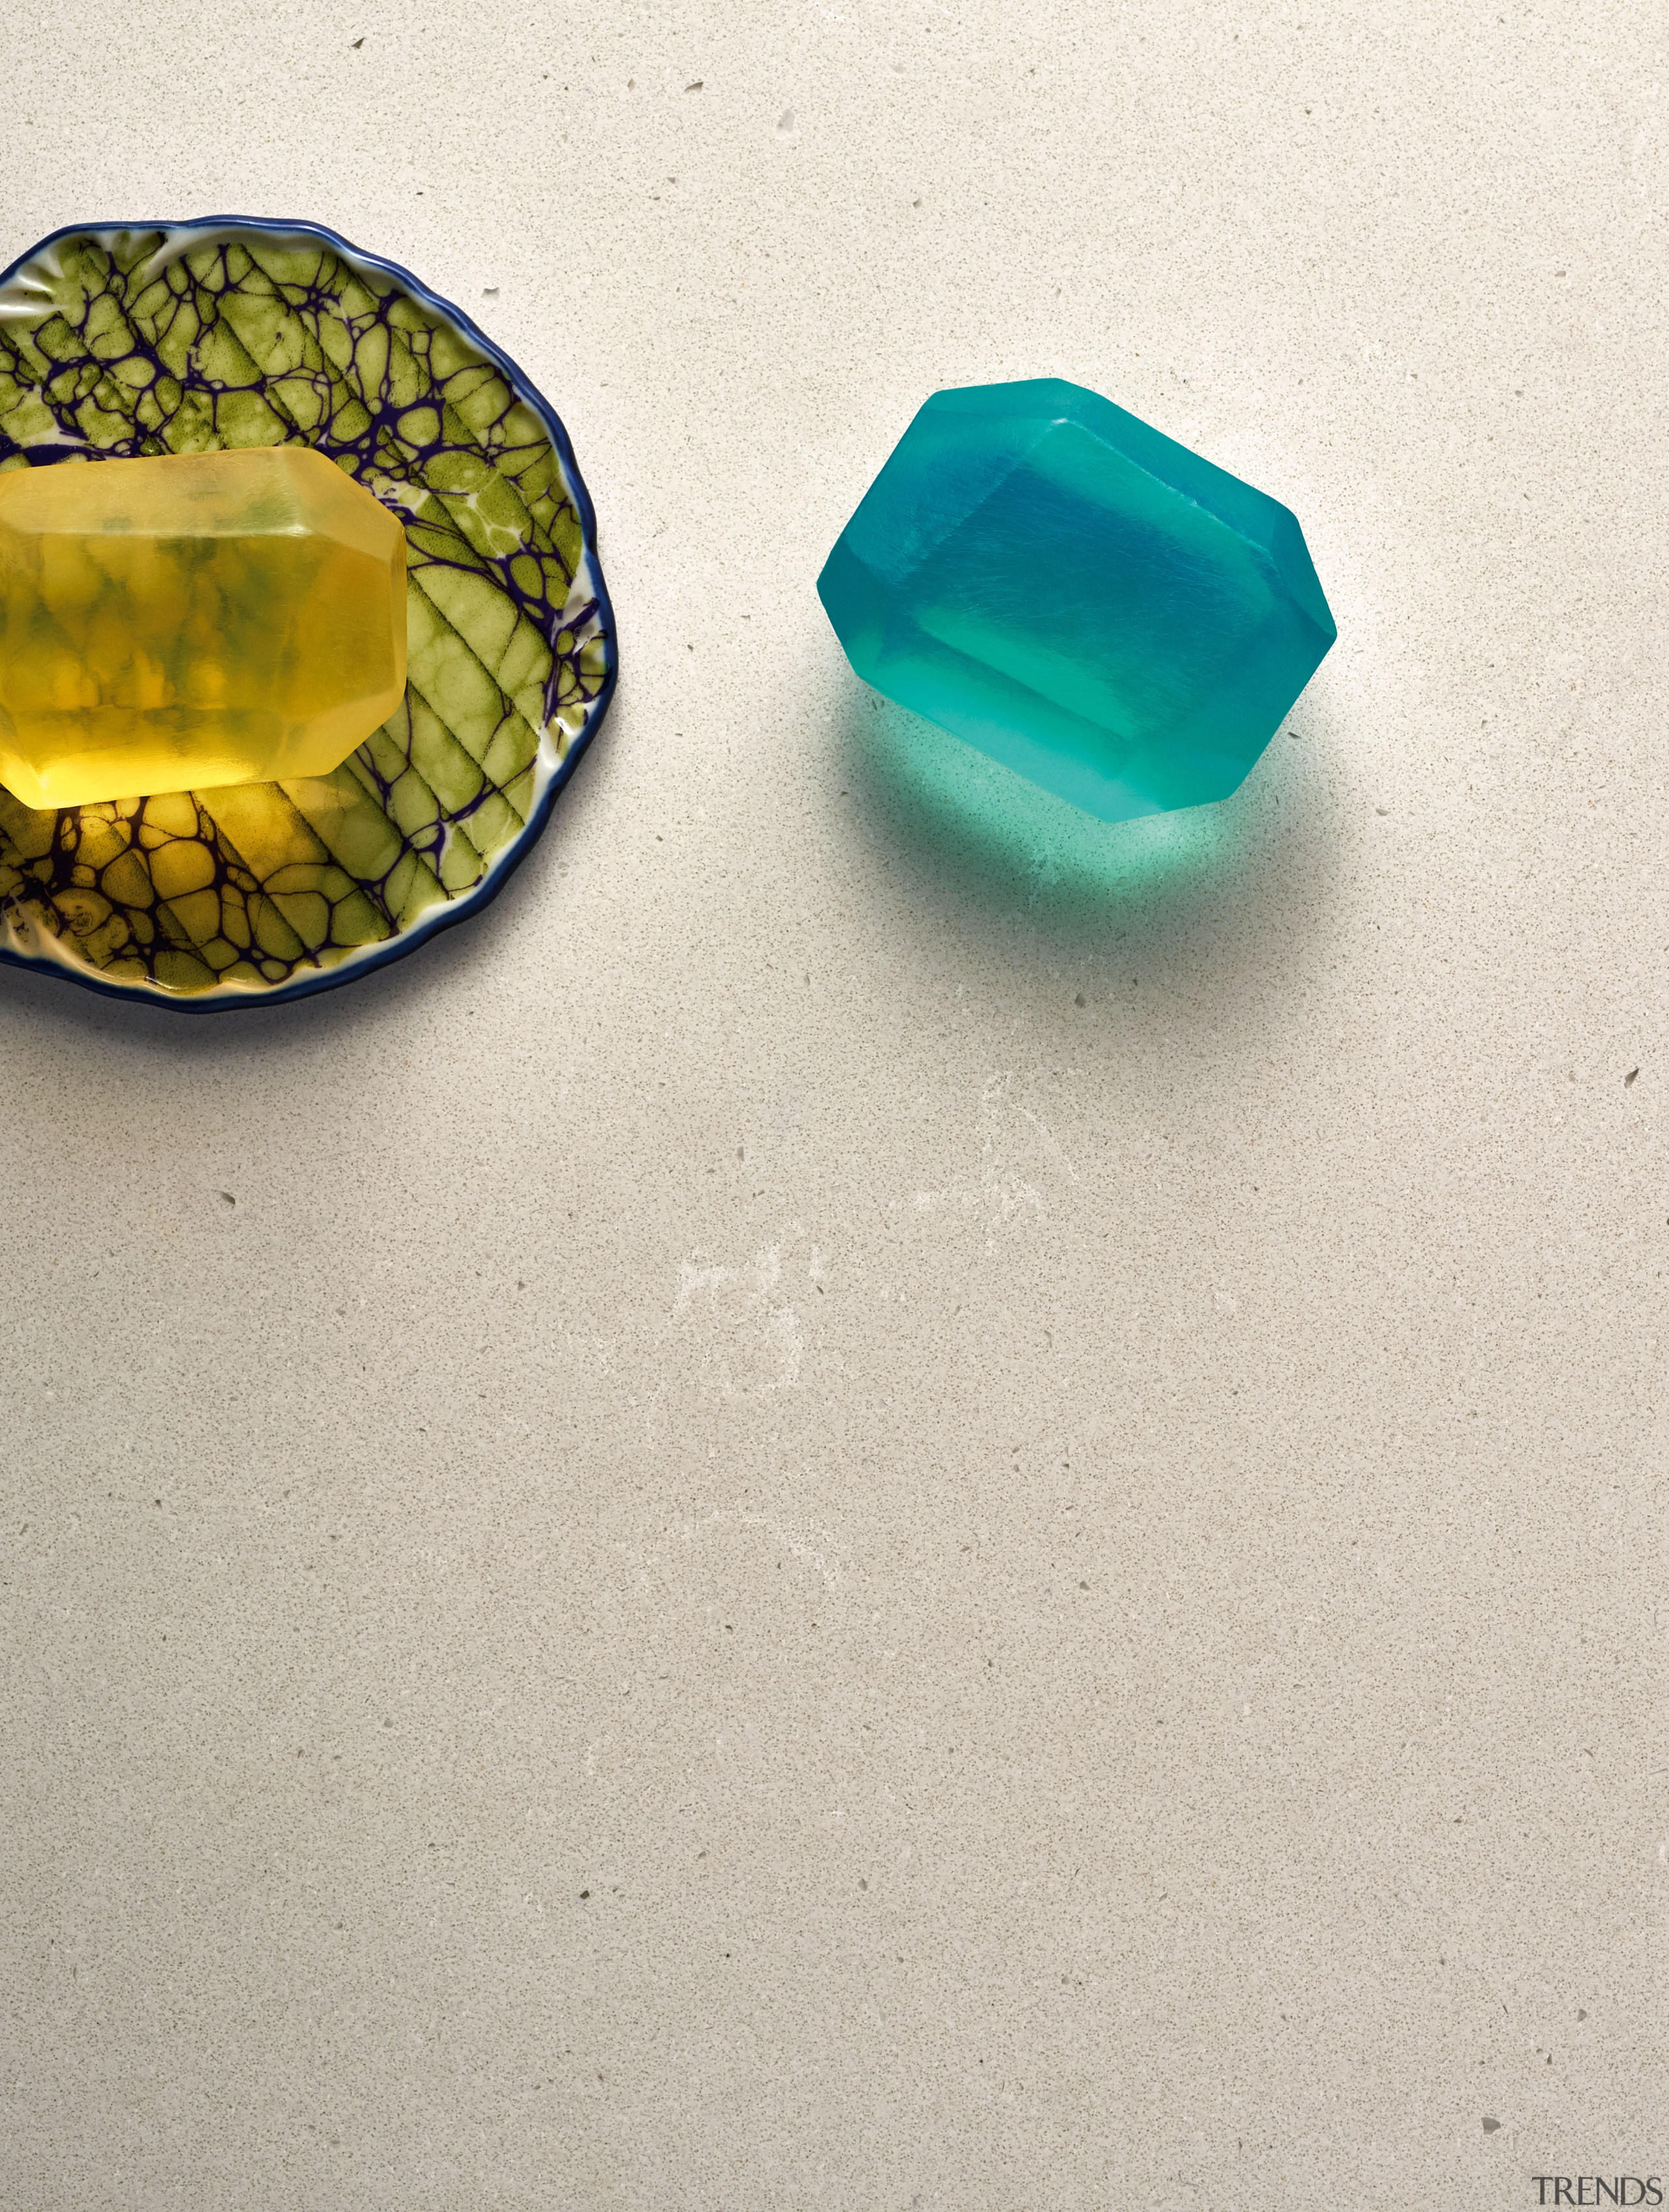 4001freshconcretecuportrait.jpg - 4001freshconcretecuportrait.jpg - gemstone   product design gemstone, product design, white